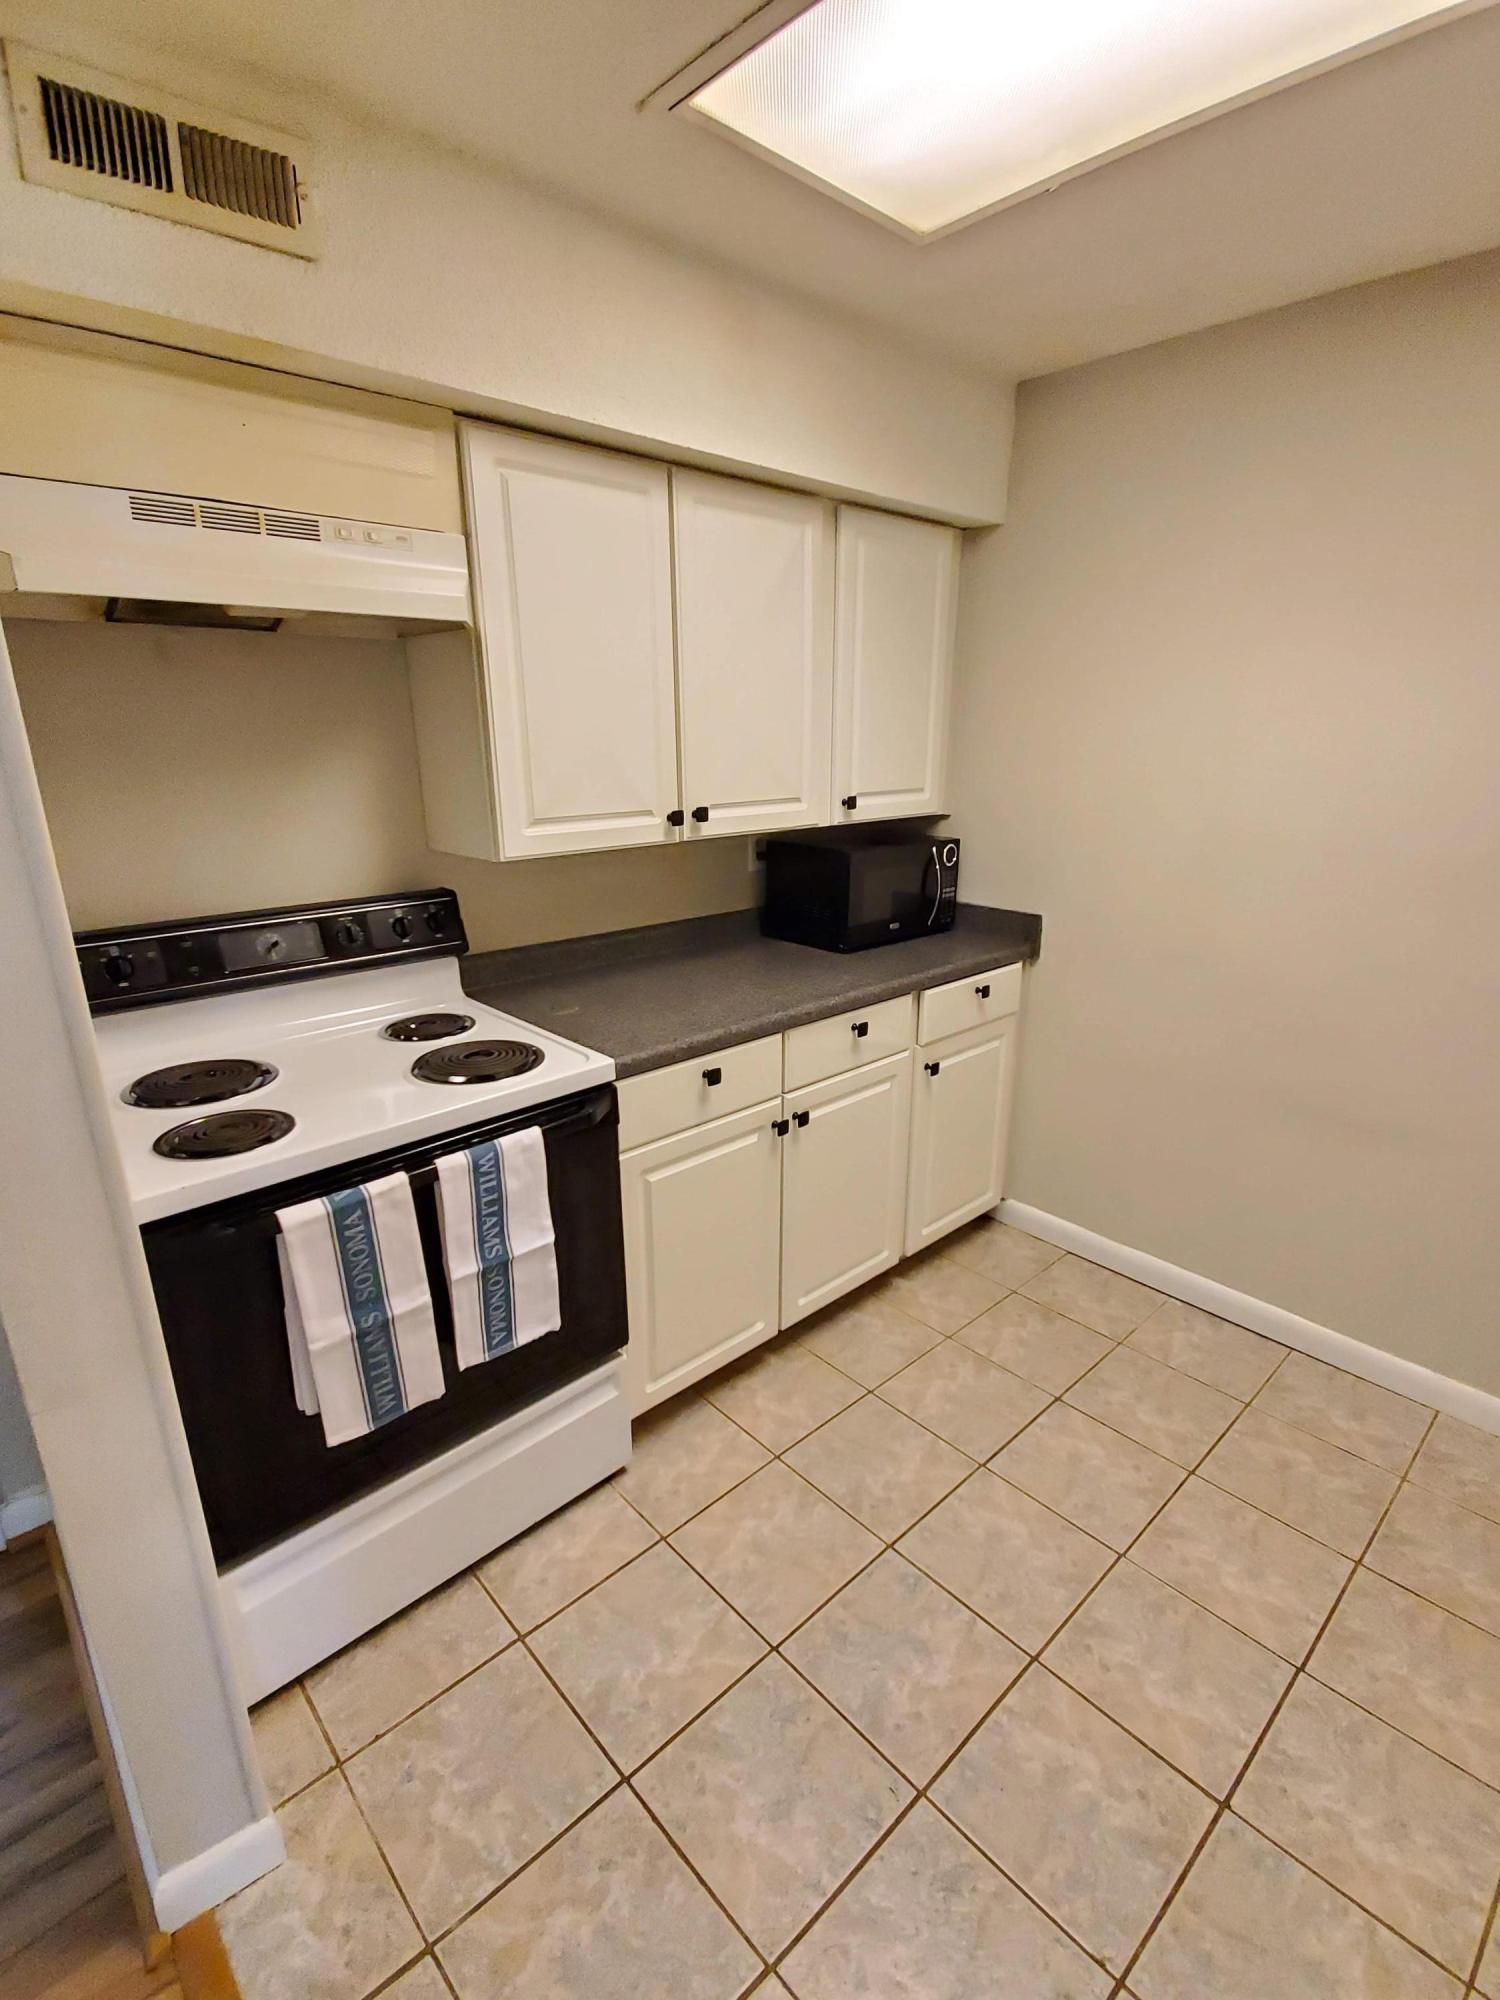 Snee Farm Homes For Sale - 105 Ventura, Mount Pleasant, SC - 17